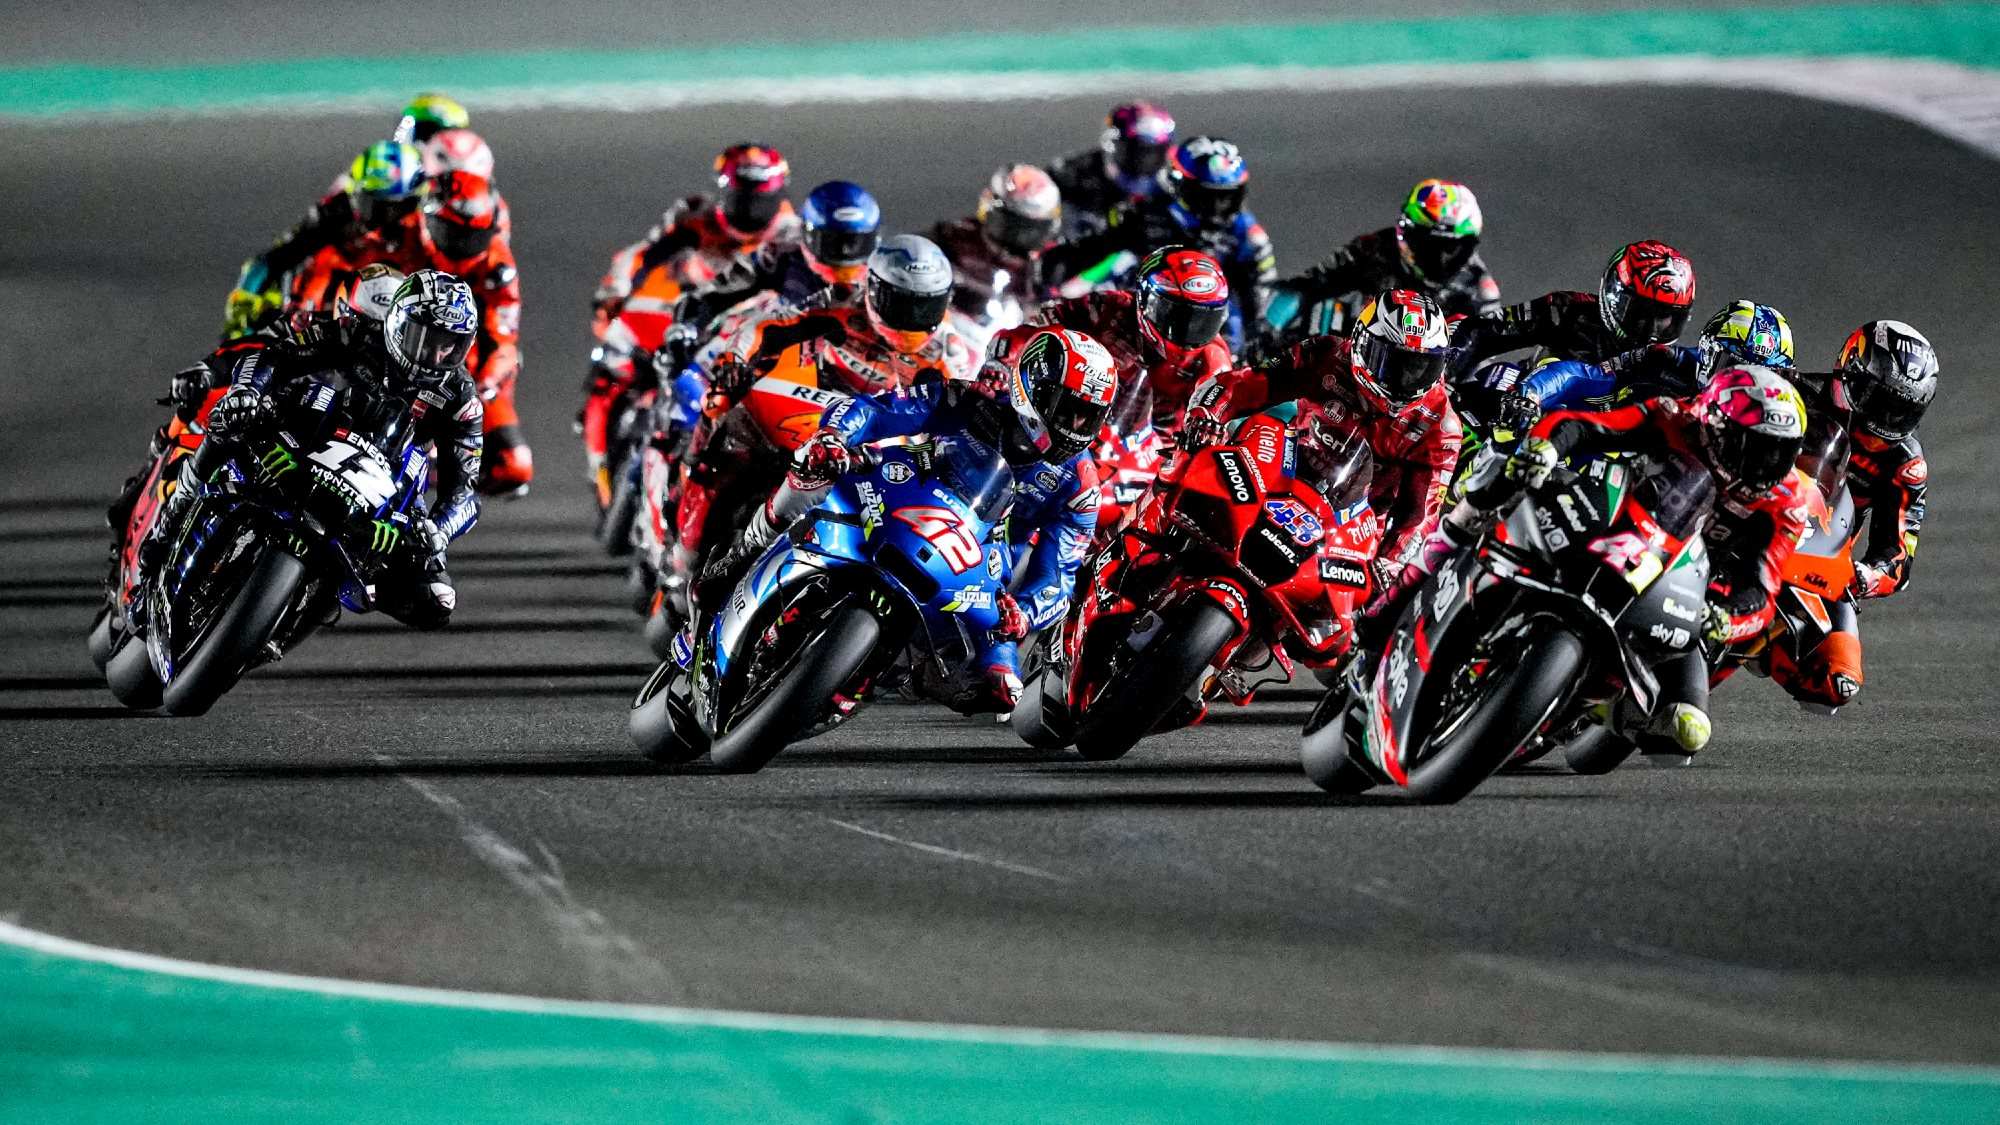 MotoGP Doha GP 2021